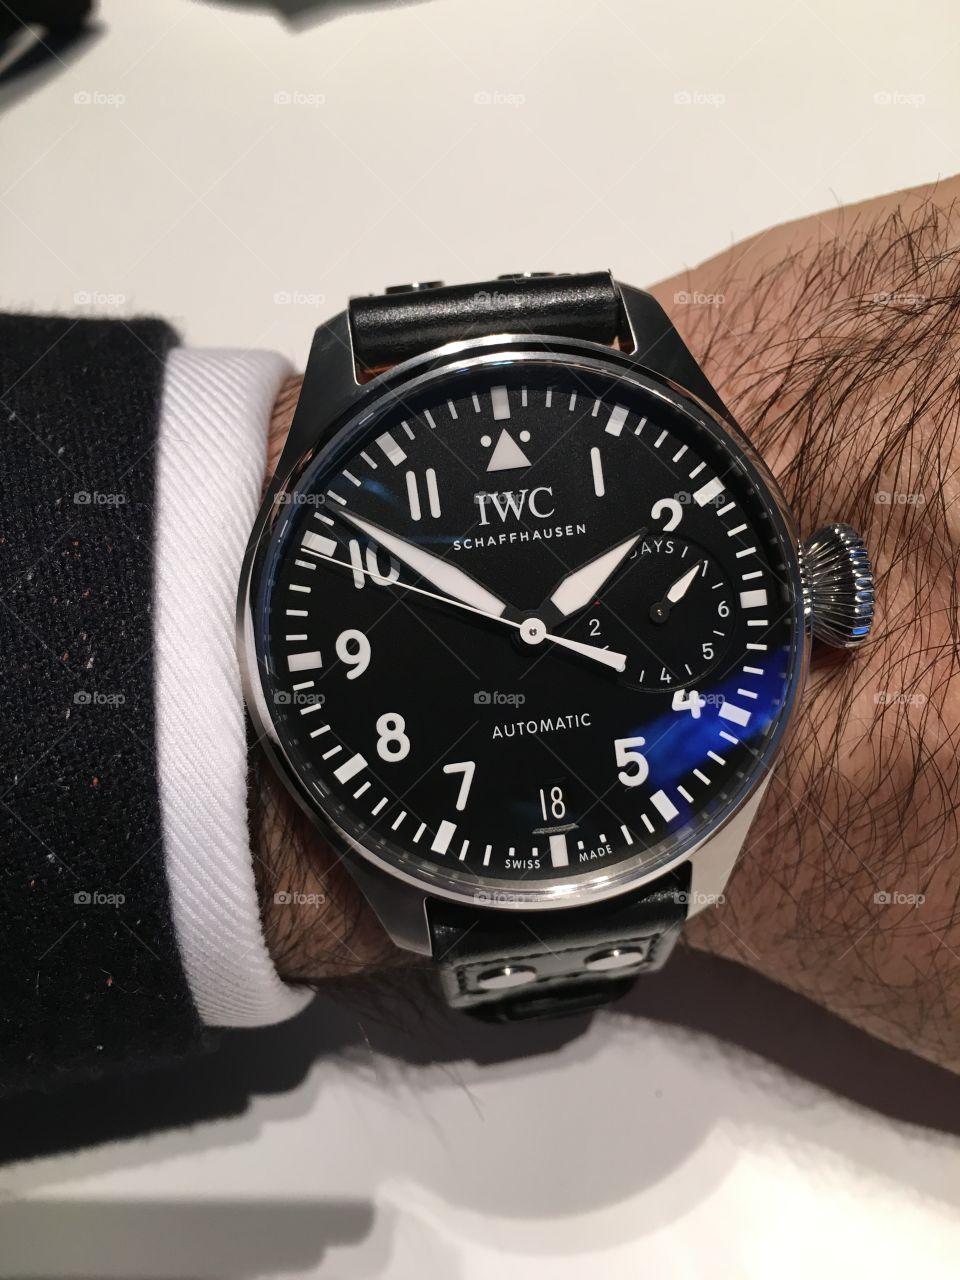 IWC Big Pilot watch on wrist